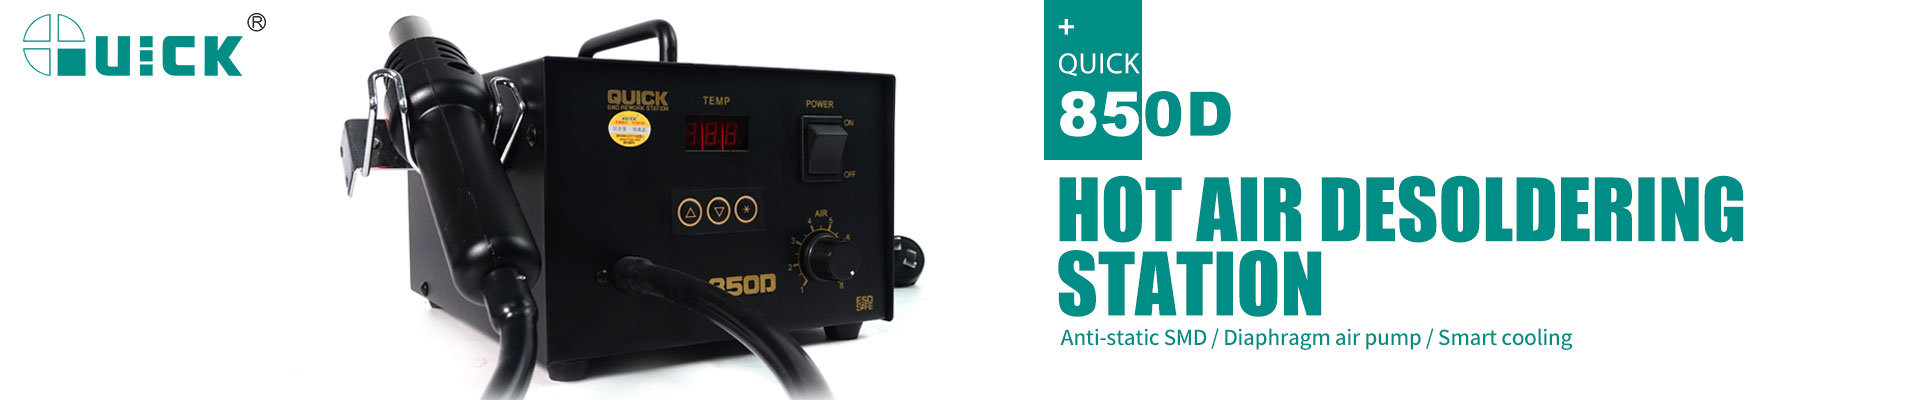 QUICK-850D